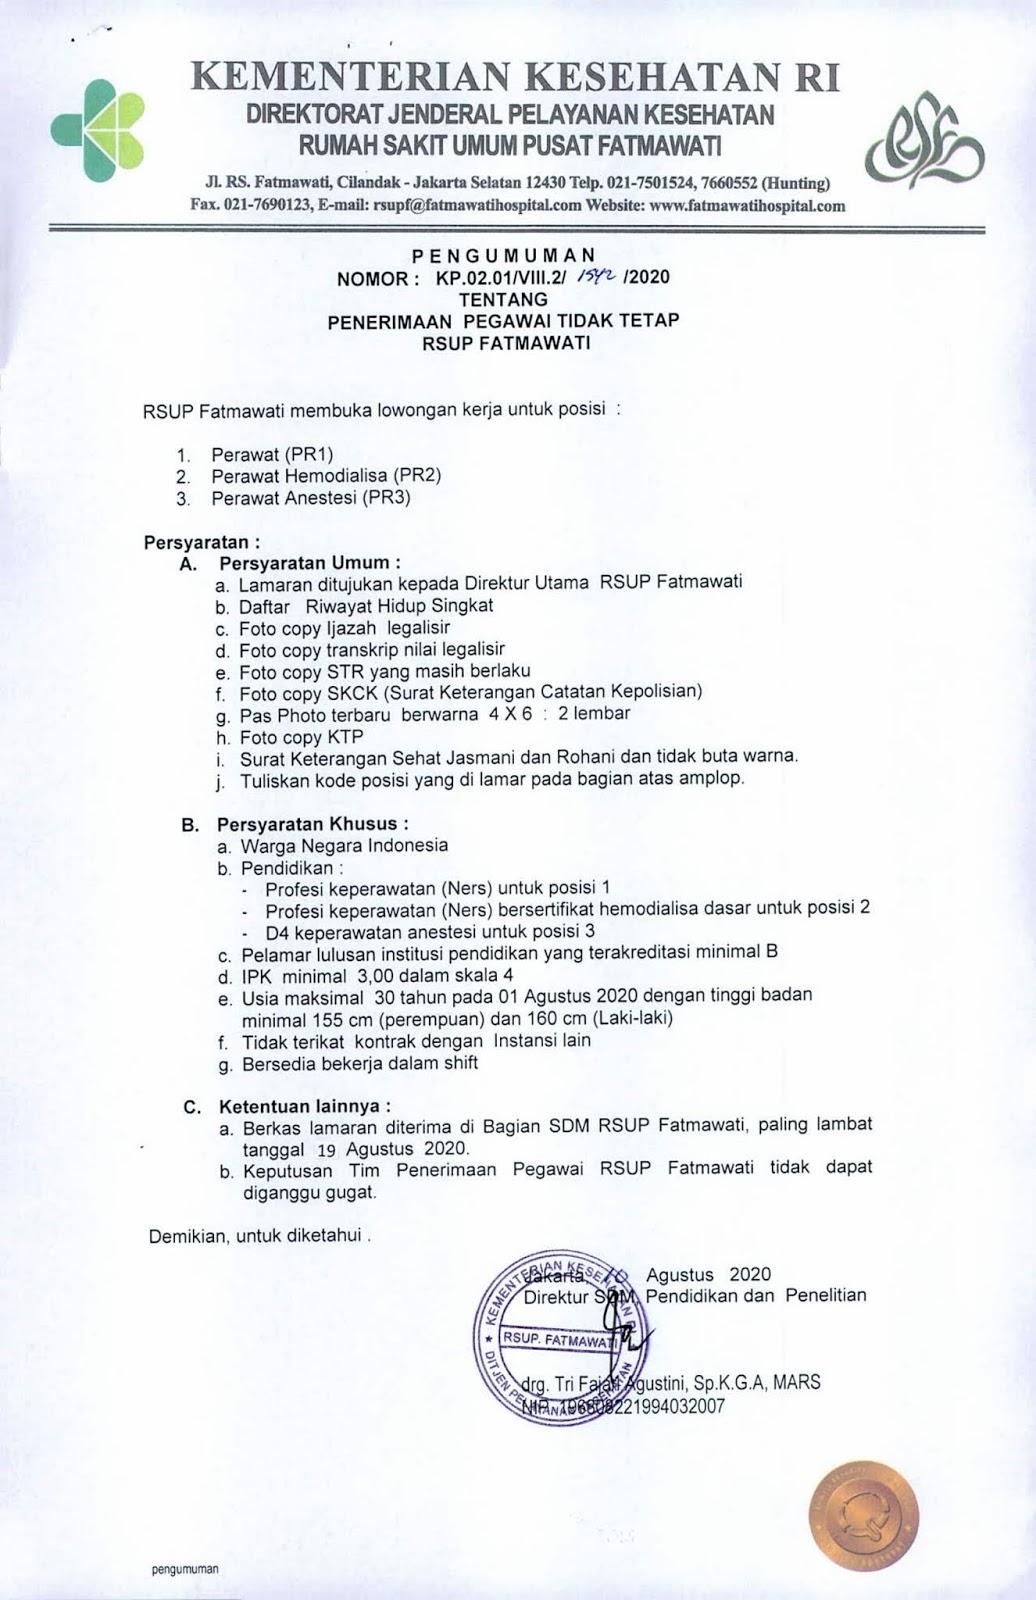 Lowongan Kerja Rumah Sakit Umum Pusat Rsup Fatmawati Bulan Agustus 2020 Rekrutmen Lowongan Kerja Bulan Februari 2021